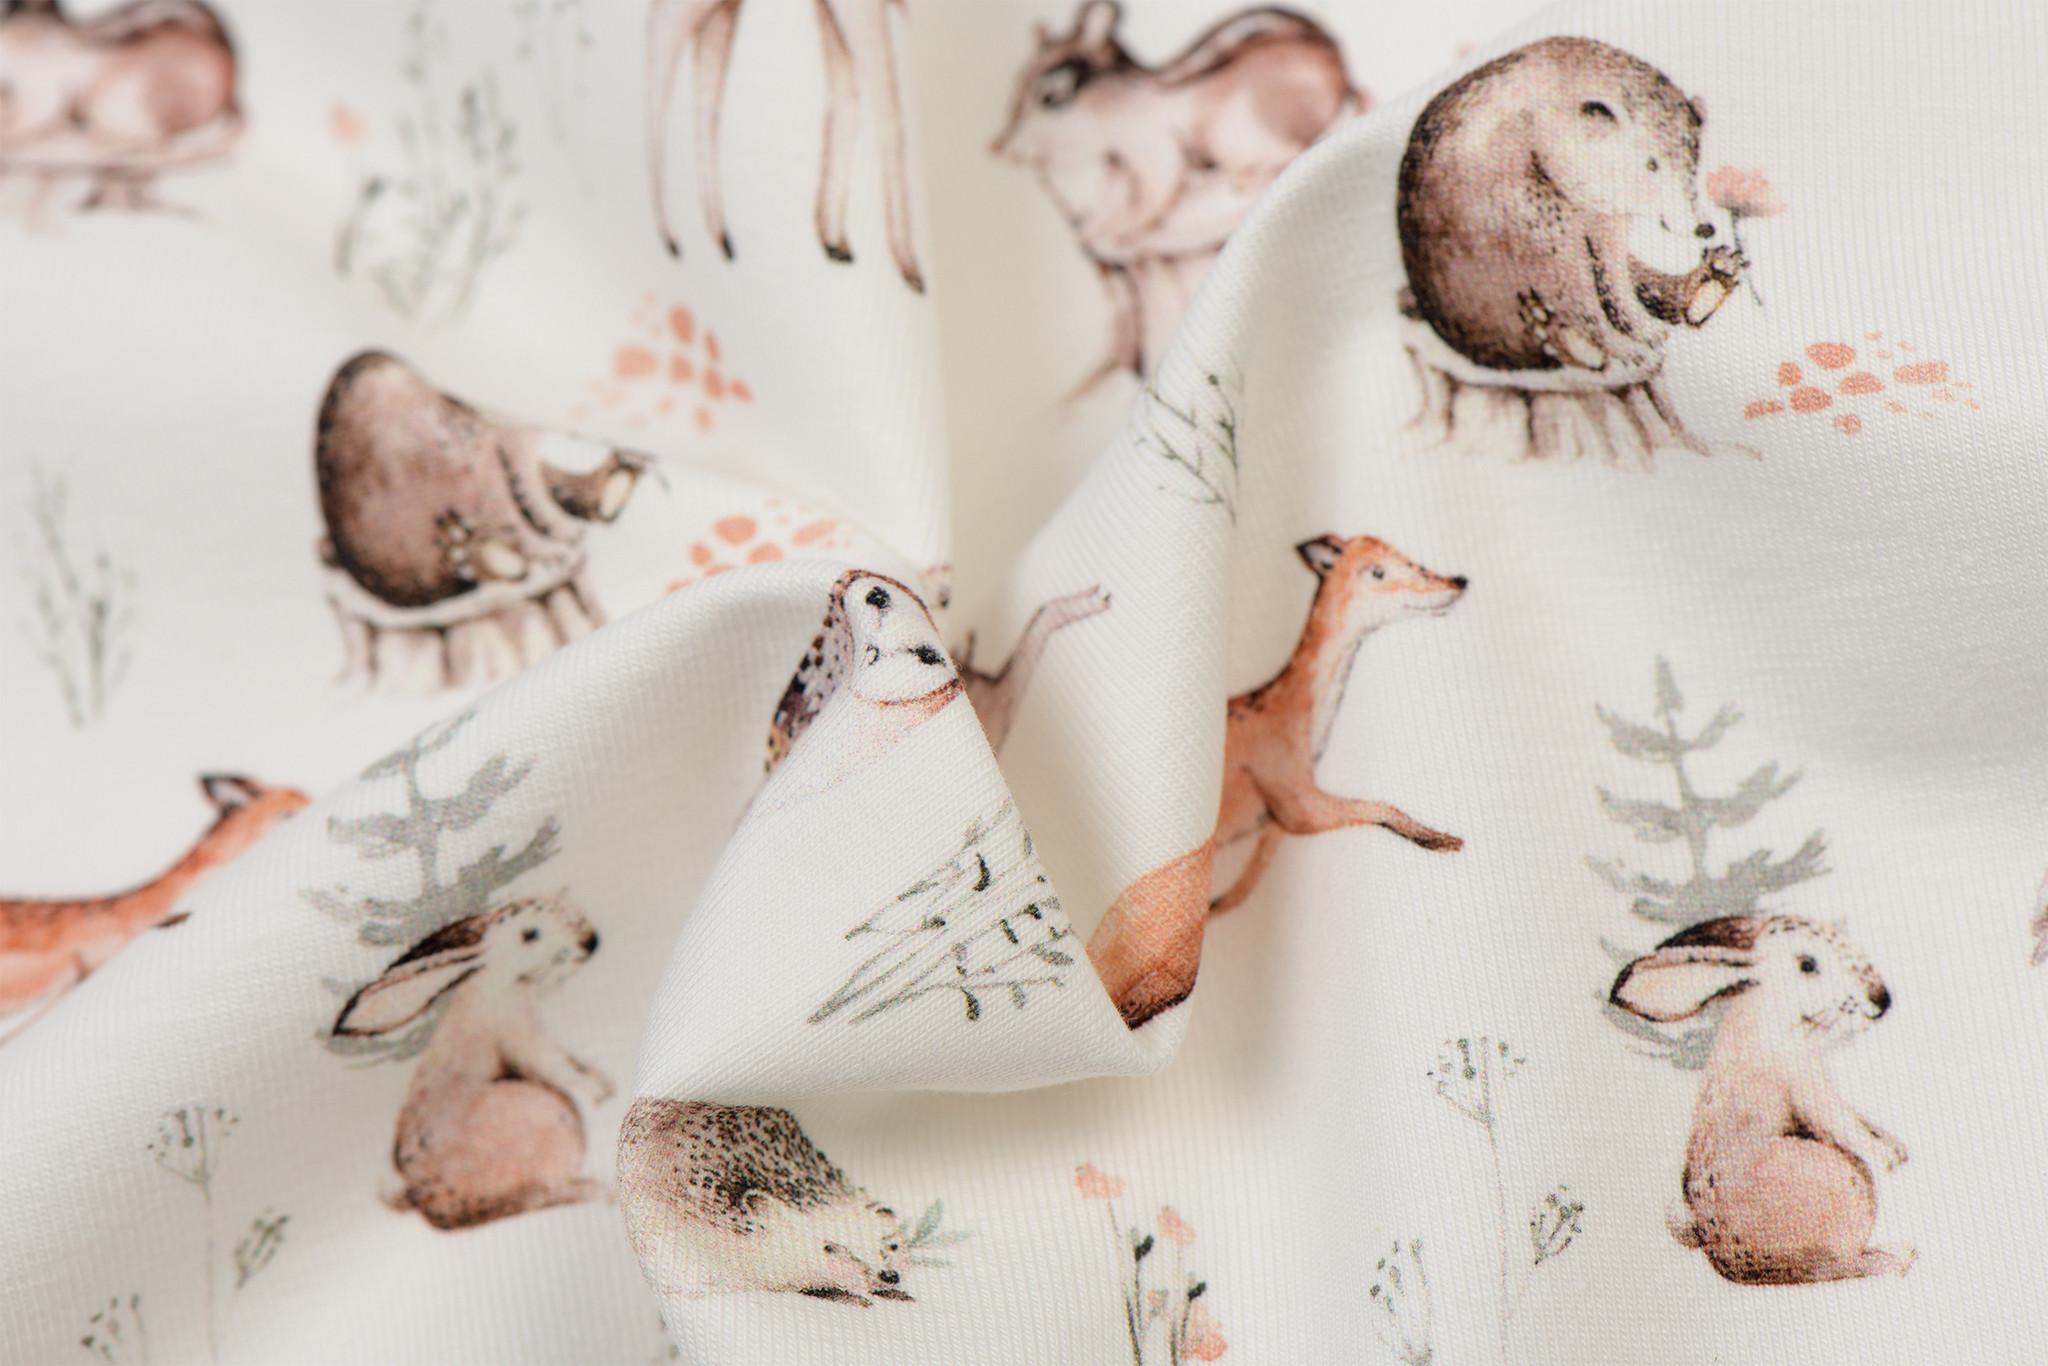 Jersey Katoen Digitale Print - Bos Dieren